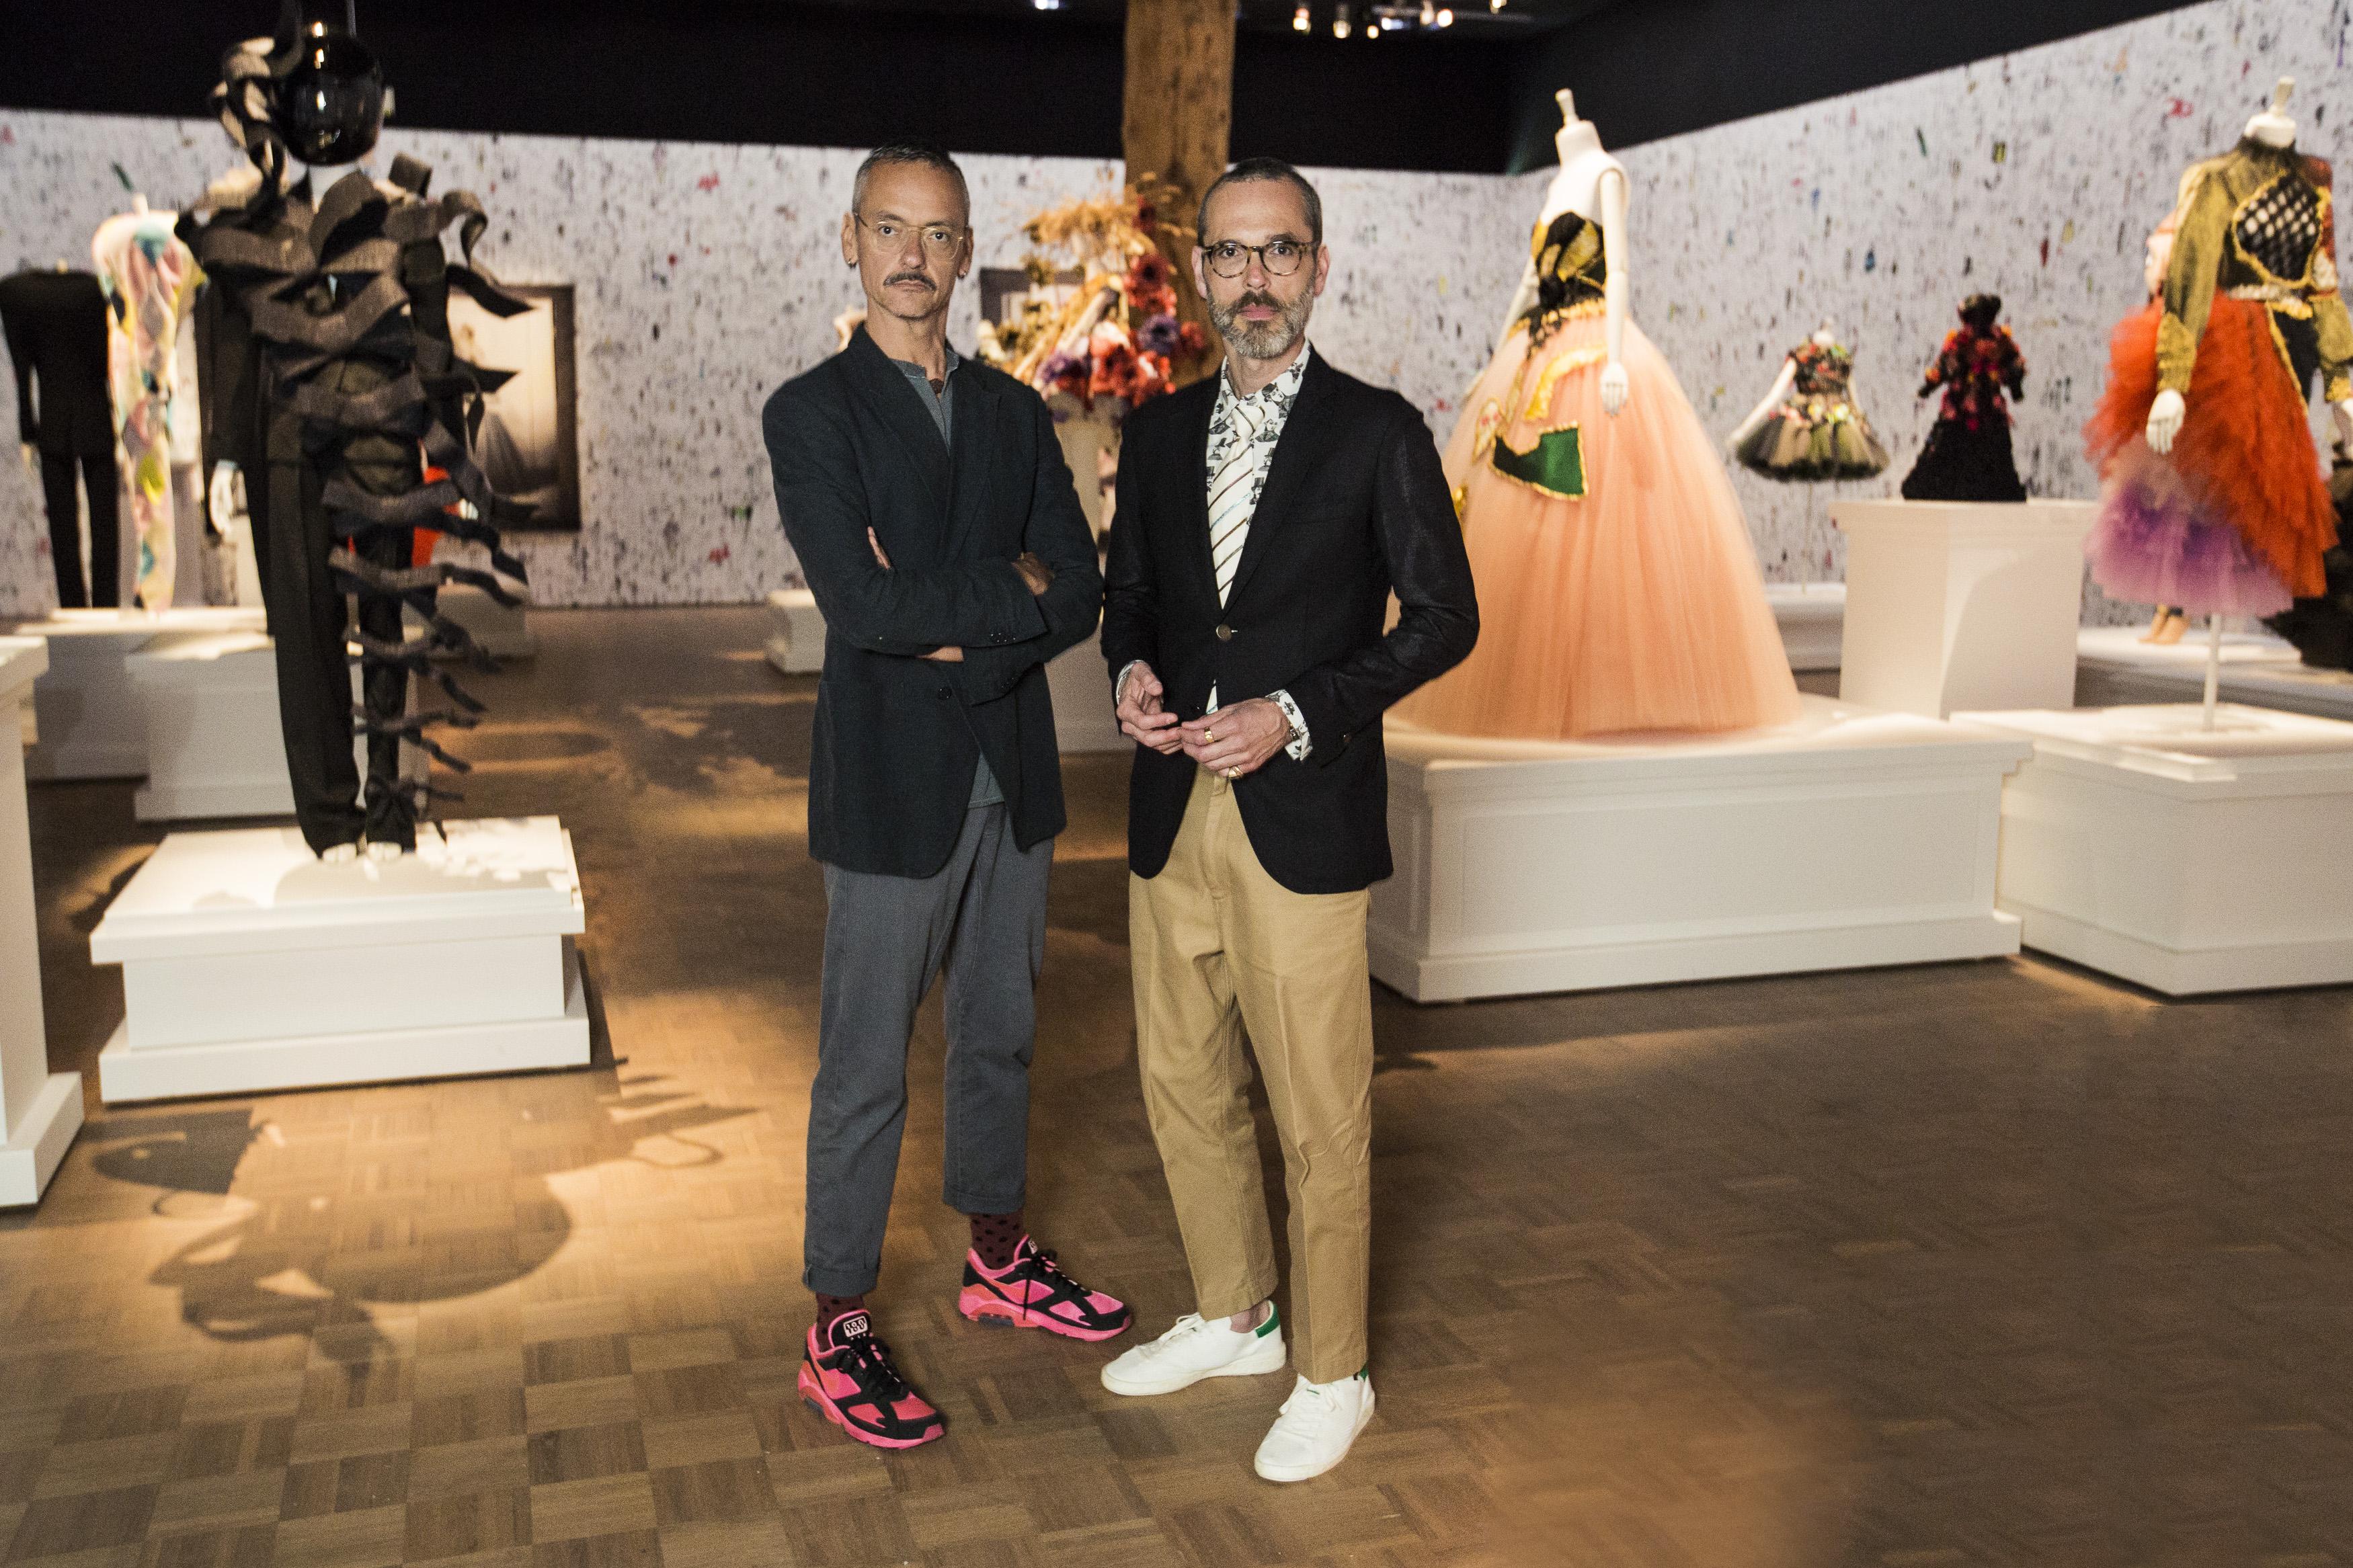 Rolf Snoeren and Viktor Horsting at their 25th anniversary retrospective at Rotterdram's Kunsthal.